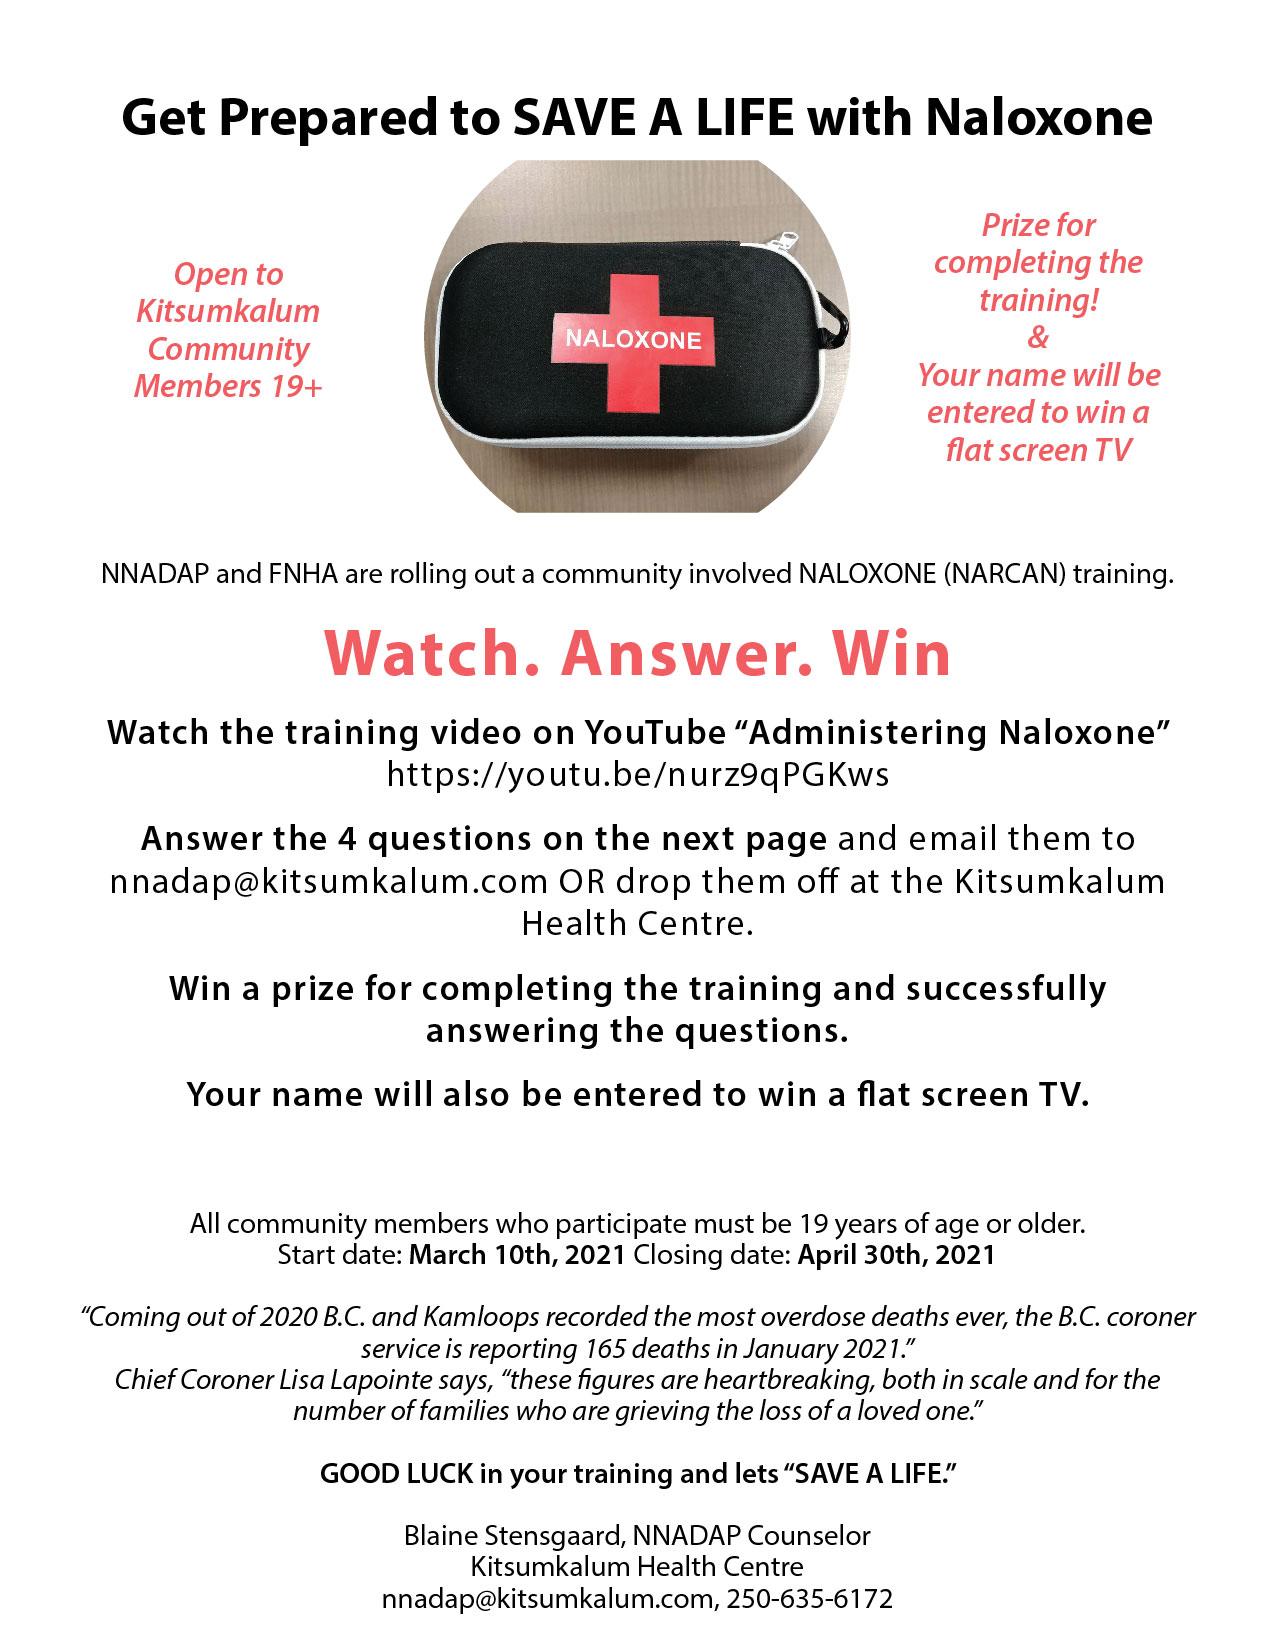 Get Prepared to Save a Life with Naloxone – Kitsumkalum Community Members